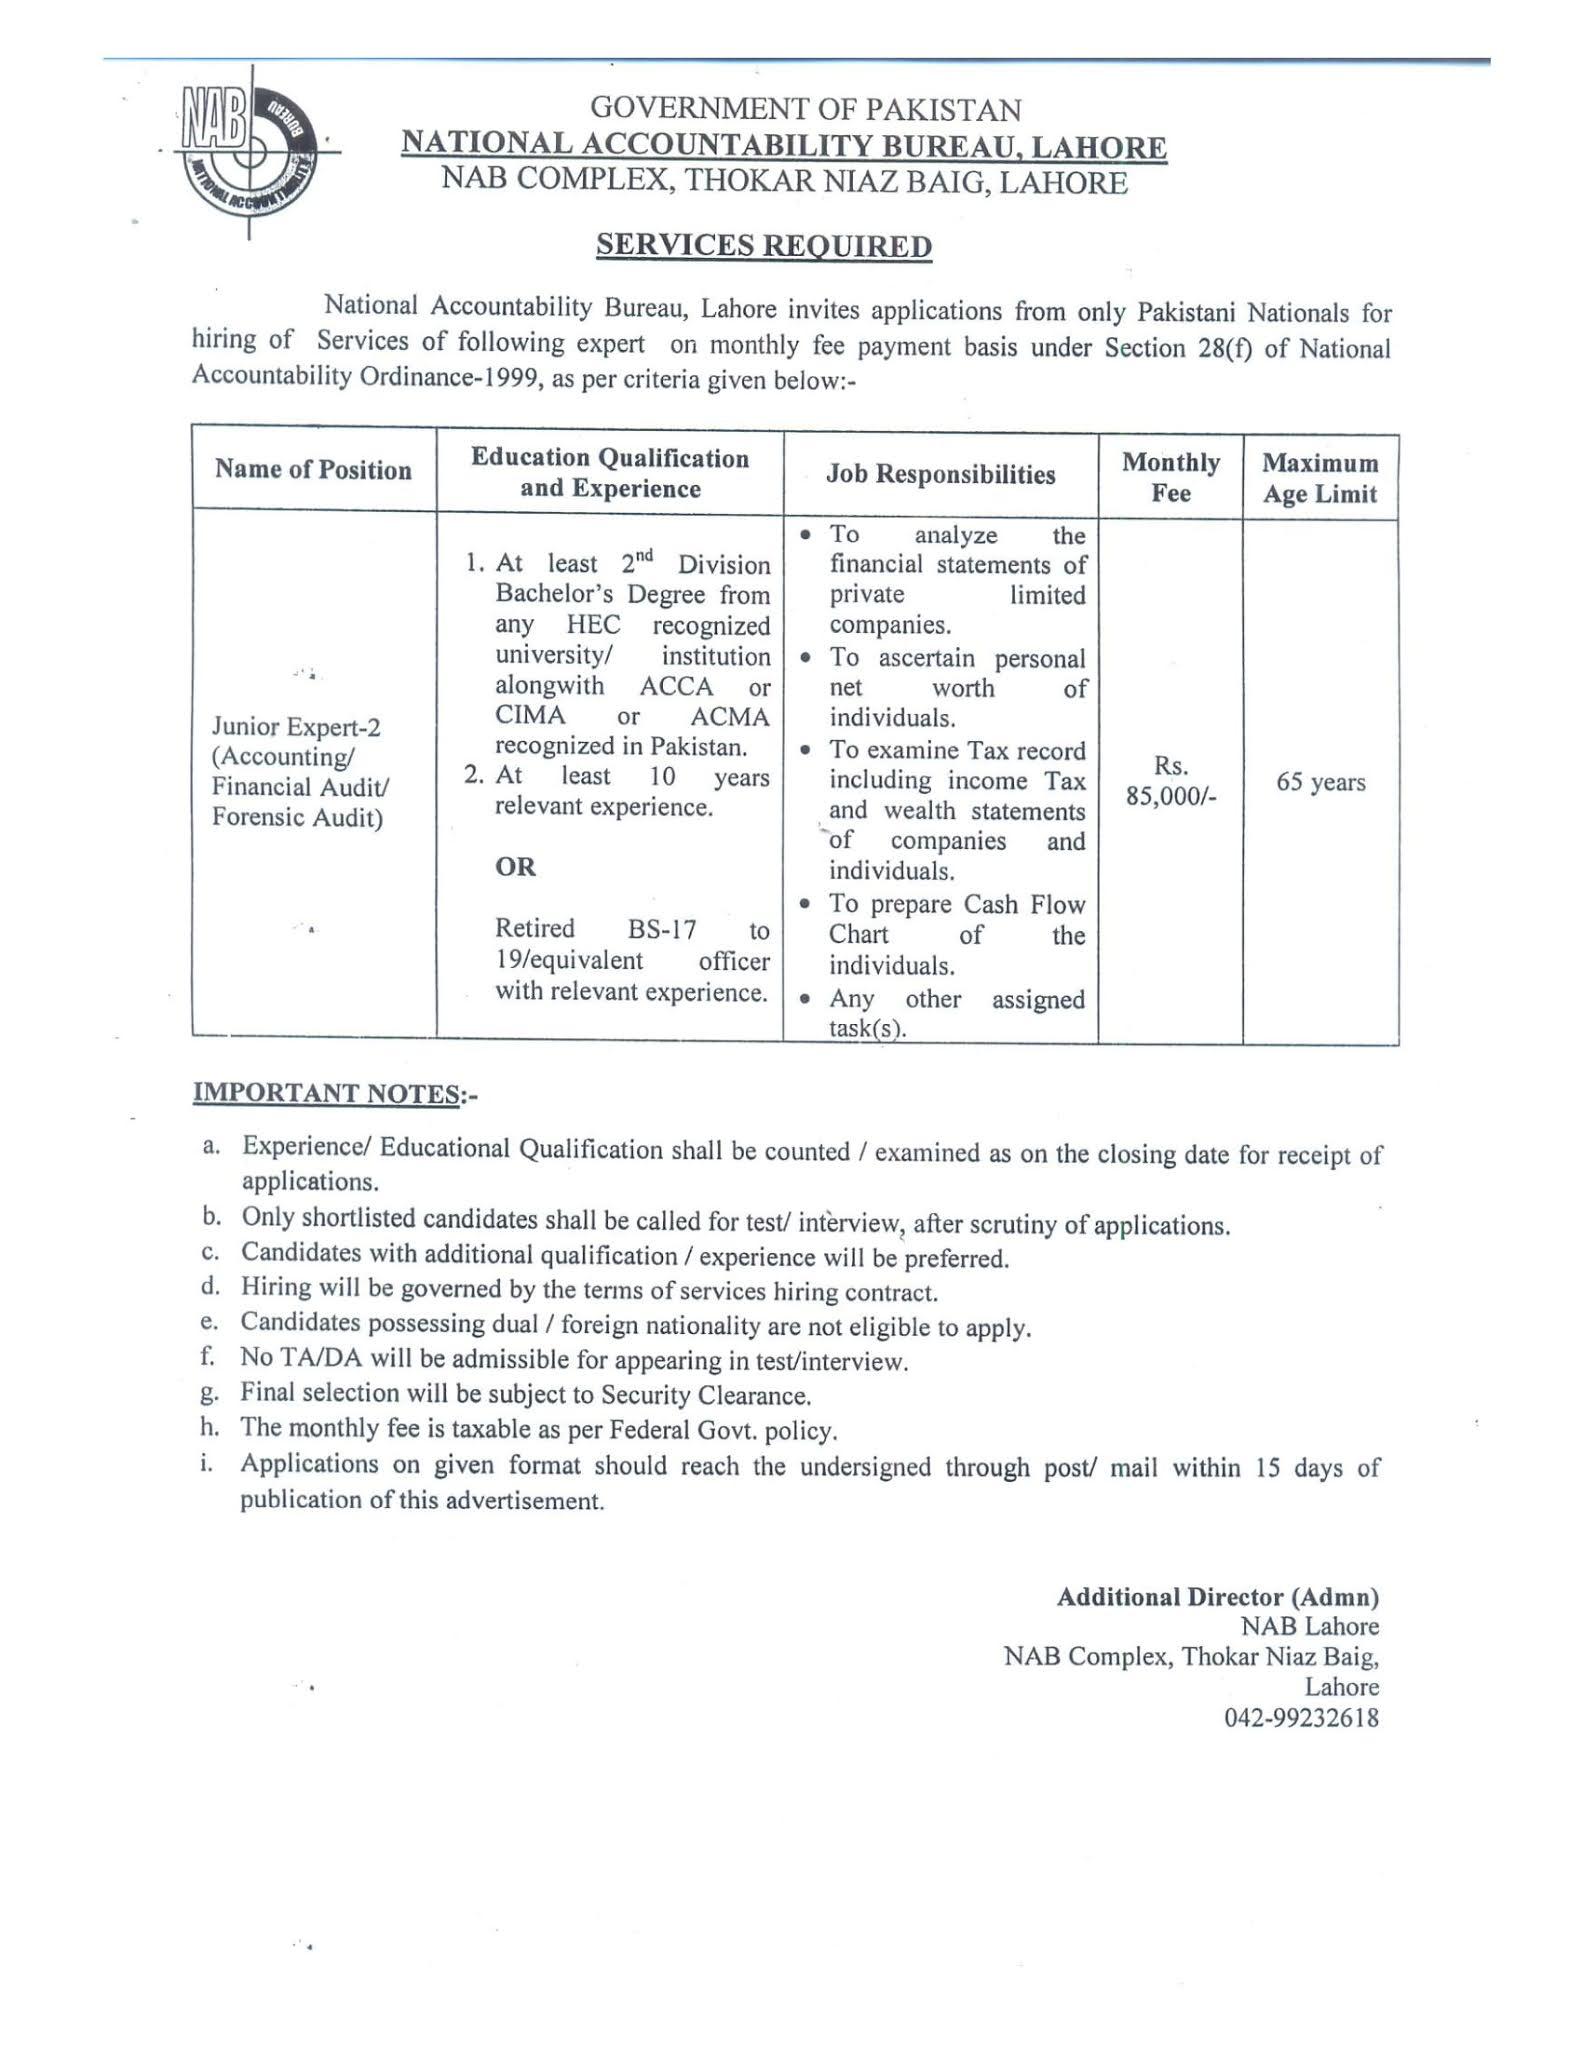 National Accountability Bureau NAB Jobs 2021 Lahore Advertisement